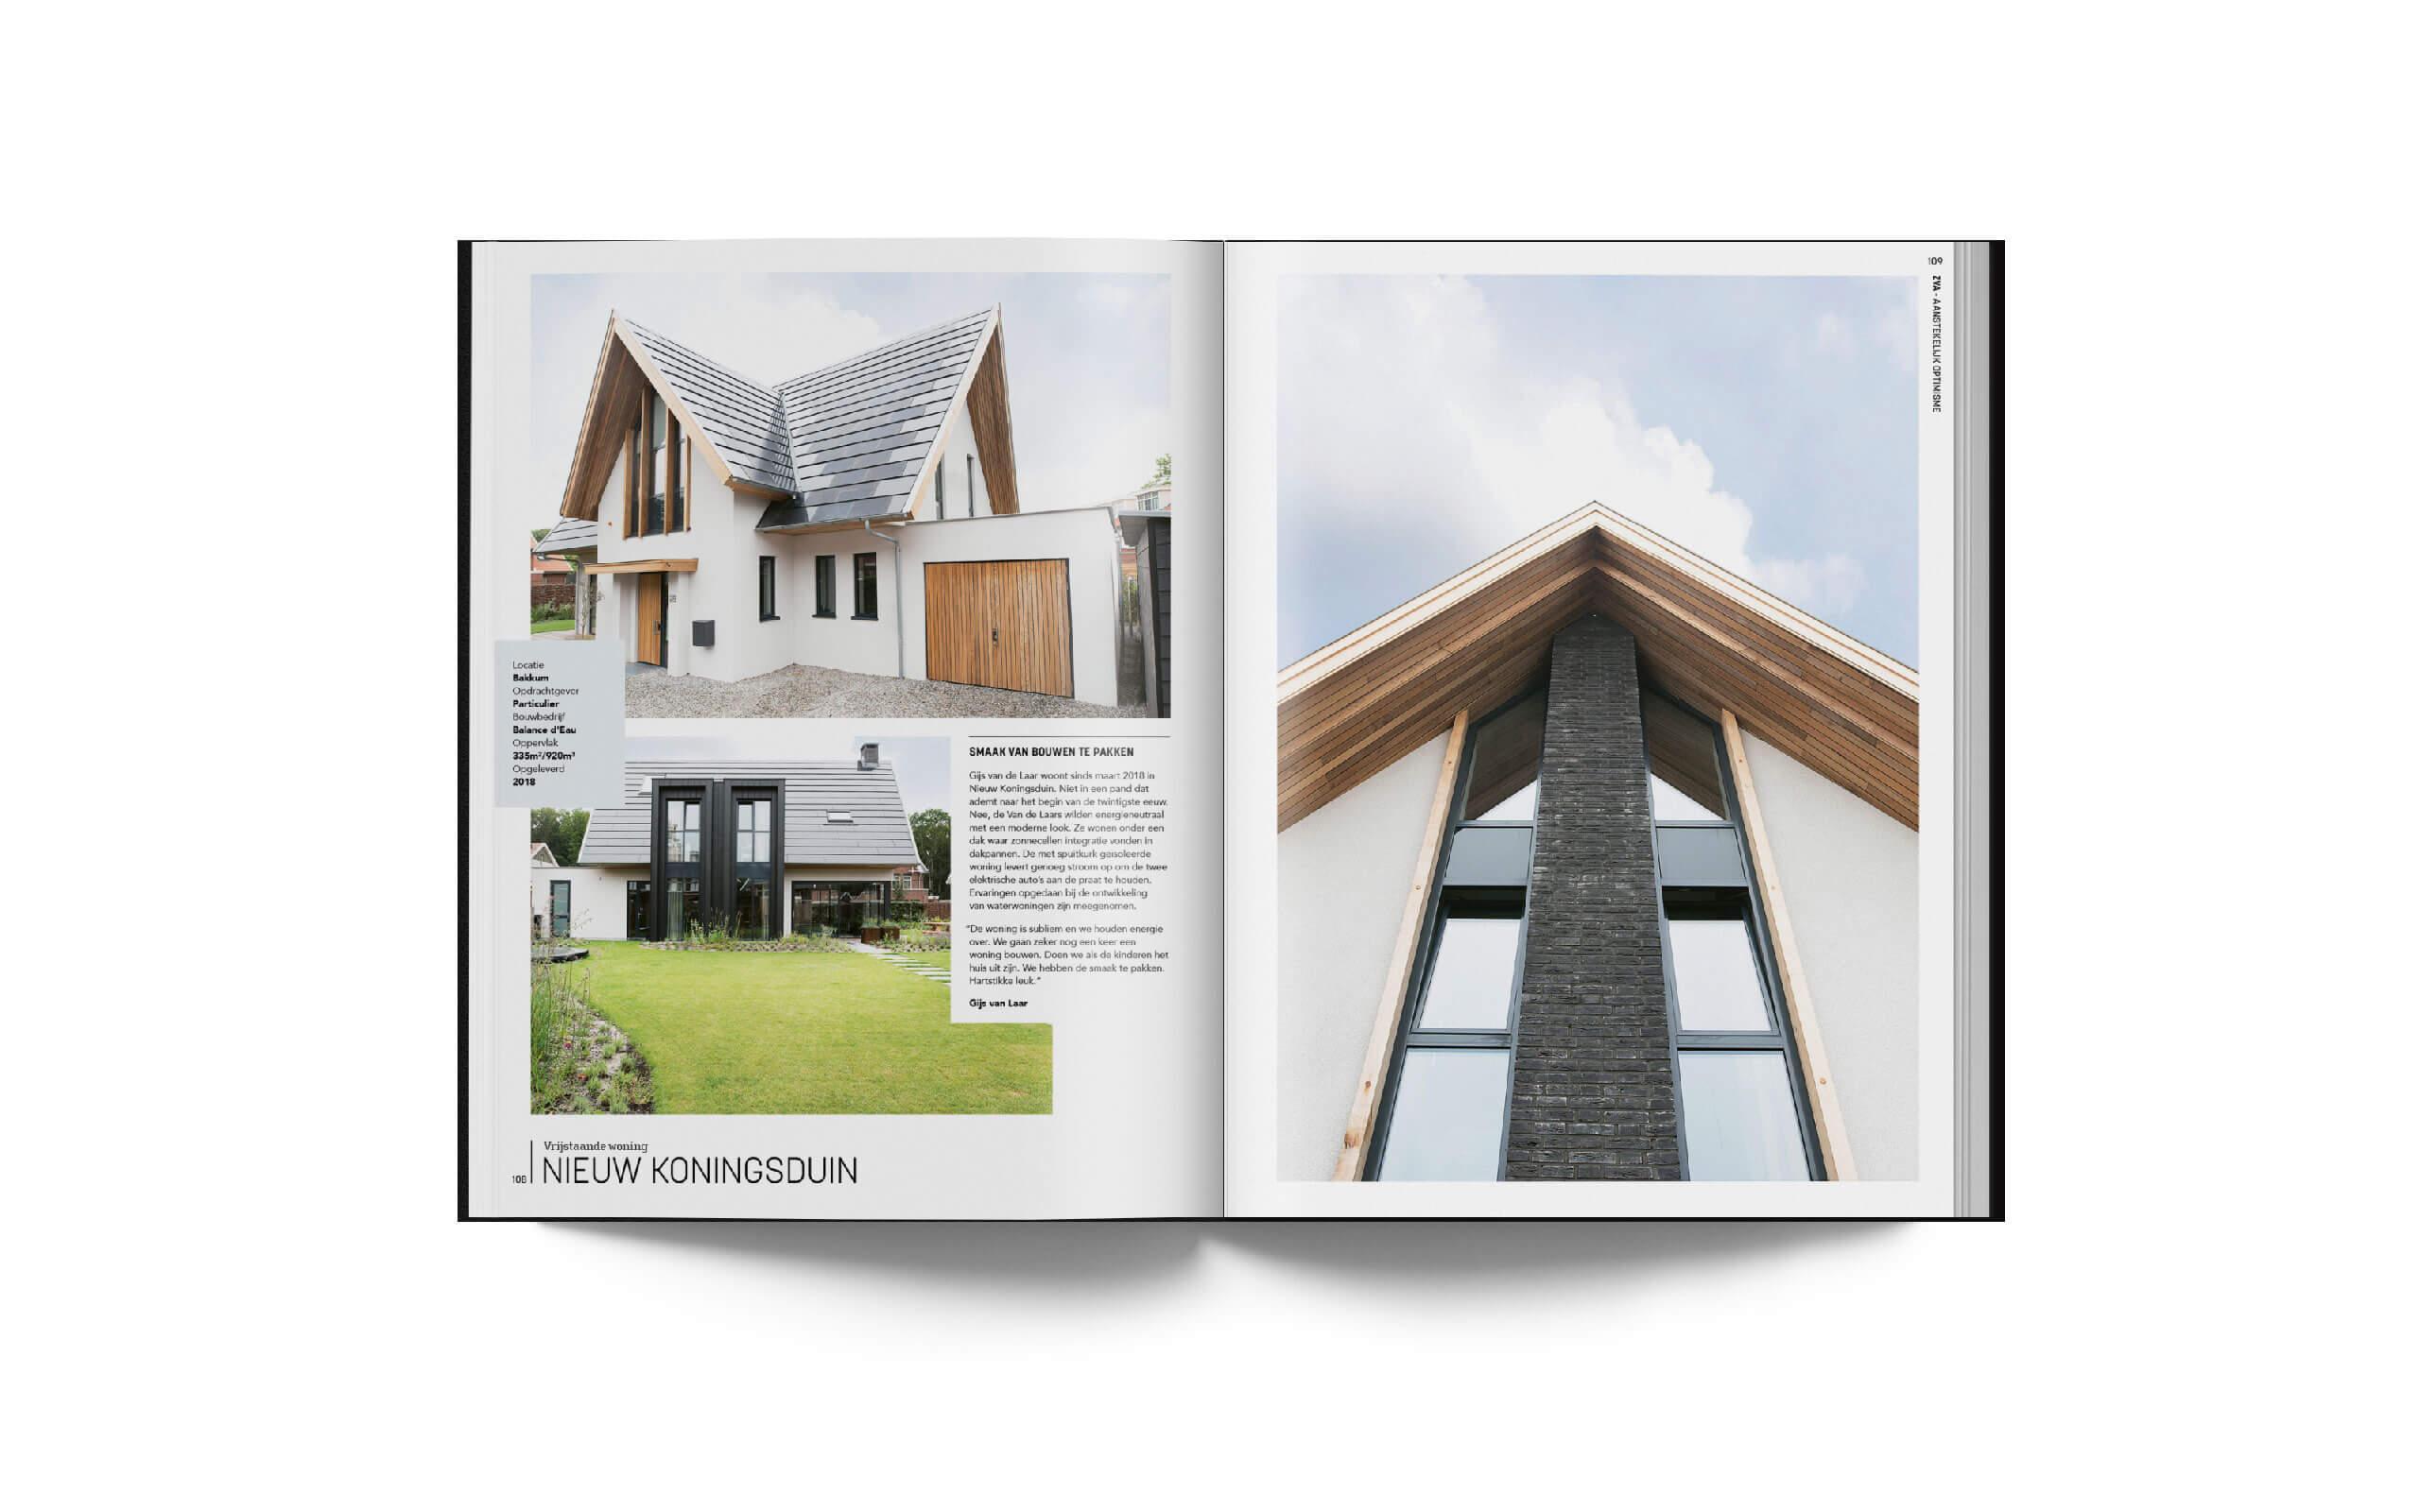 ZVA architecten jubileum boek